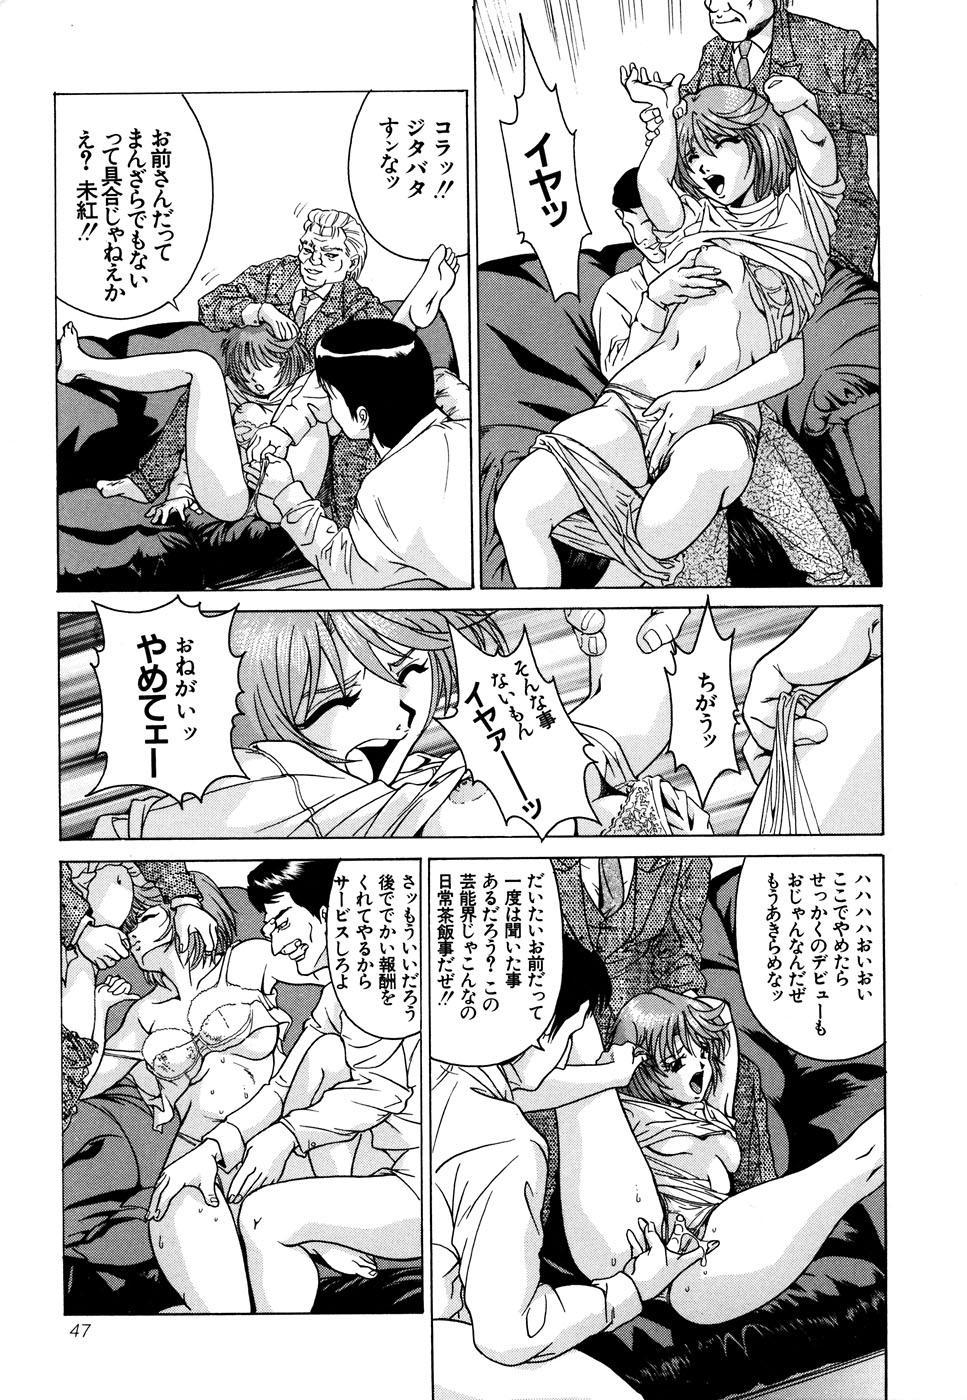 G-drive Vol.1 Ryoujokuhen 46